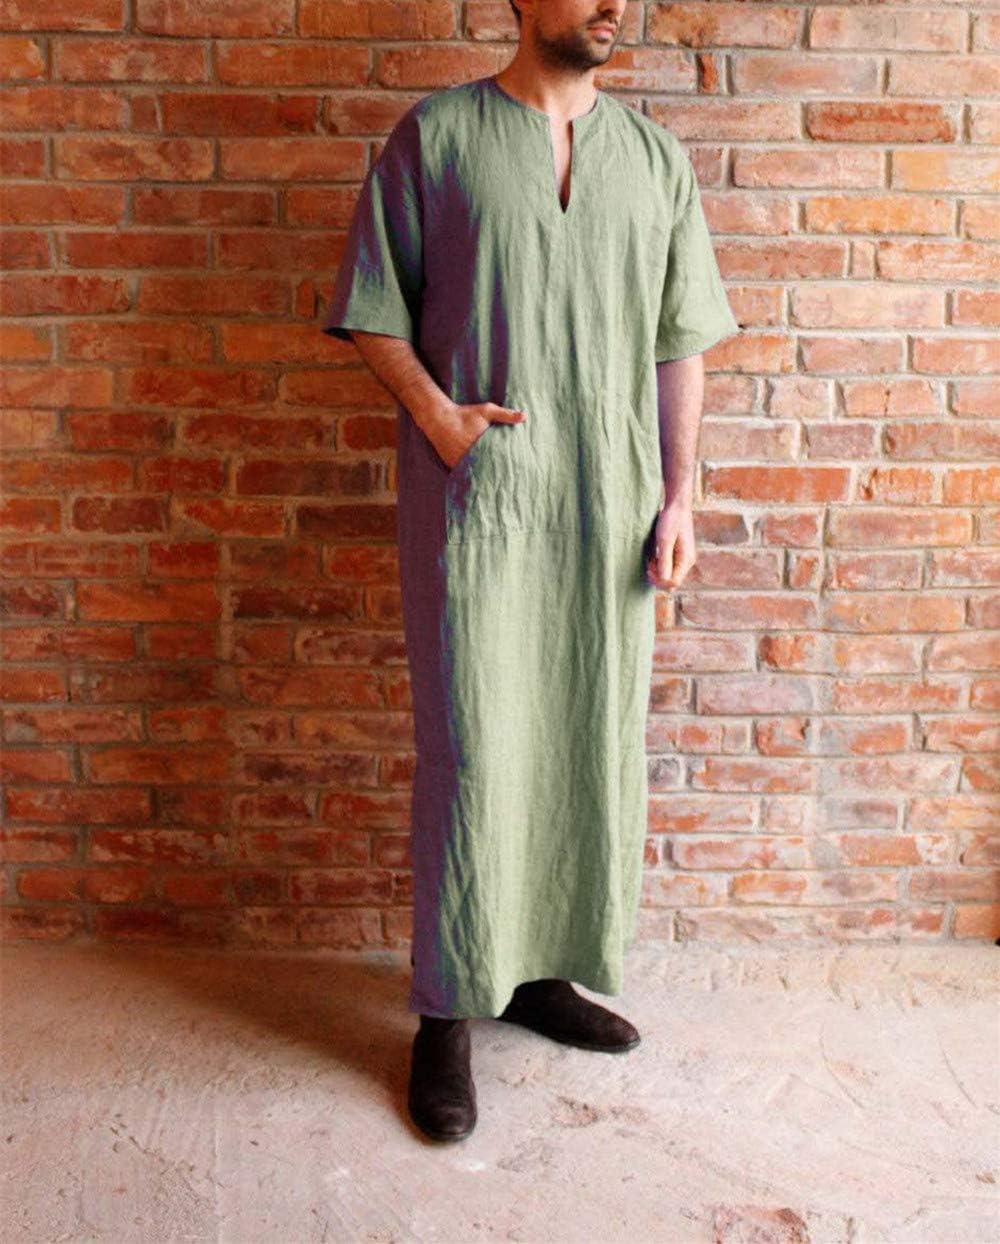 Hoverwin Herren Casual Ethnisch Robe Lose Baumwolle Leinen Kurzarm D/ünn Jahrgang Kleid Kaftan V-Ausschnitt Lang T-Shirt Mit Taschen 3XL, Gr/ün